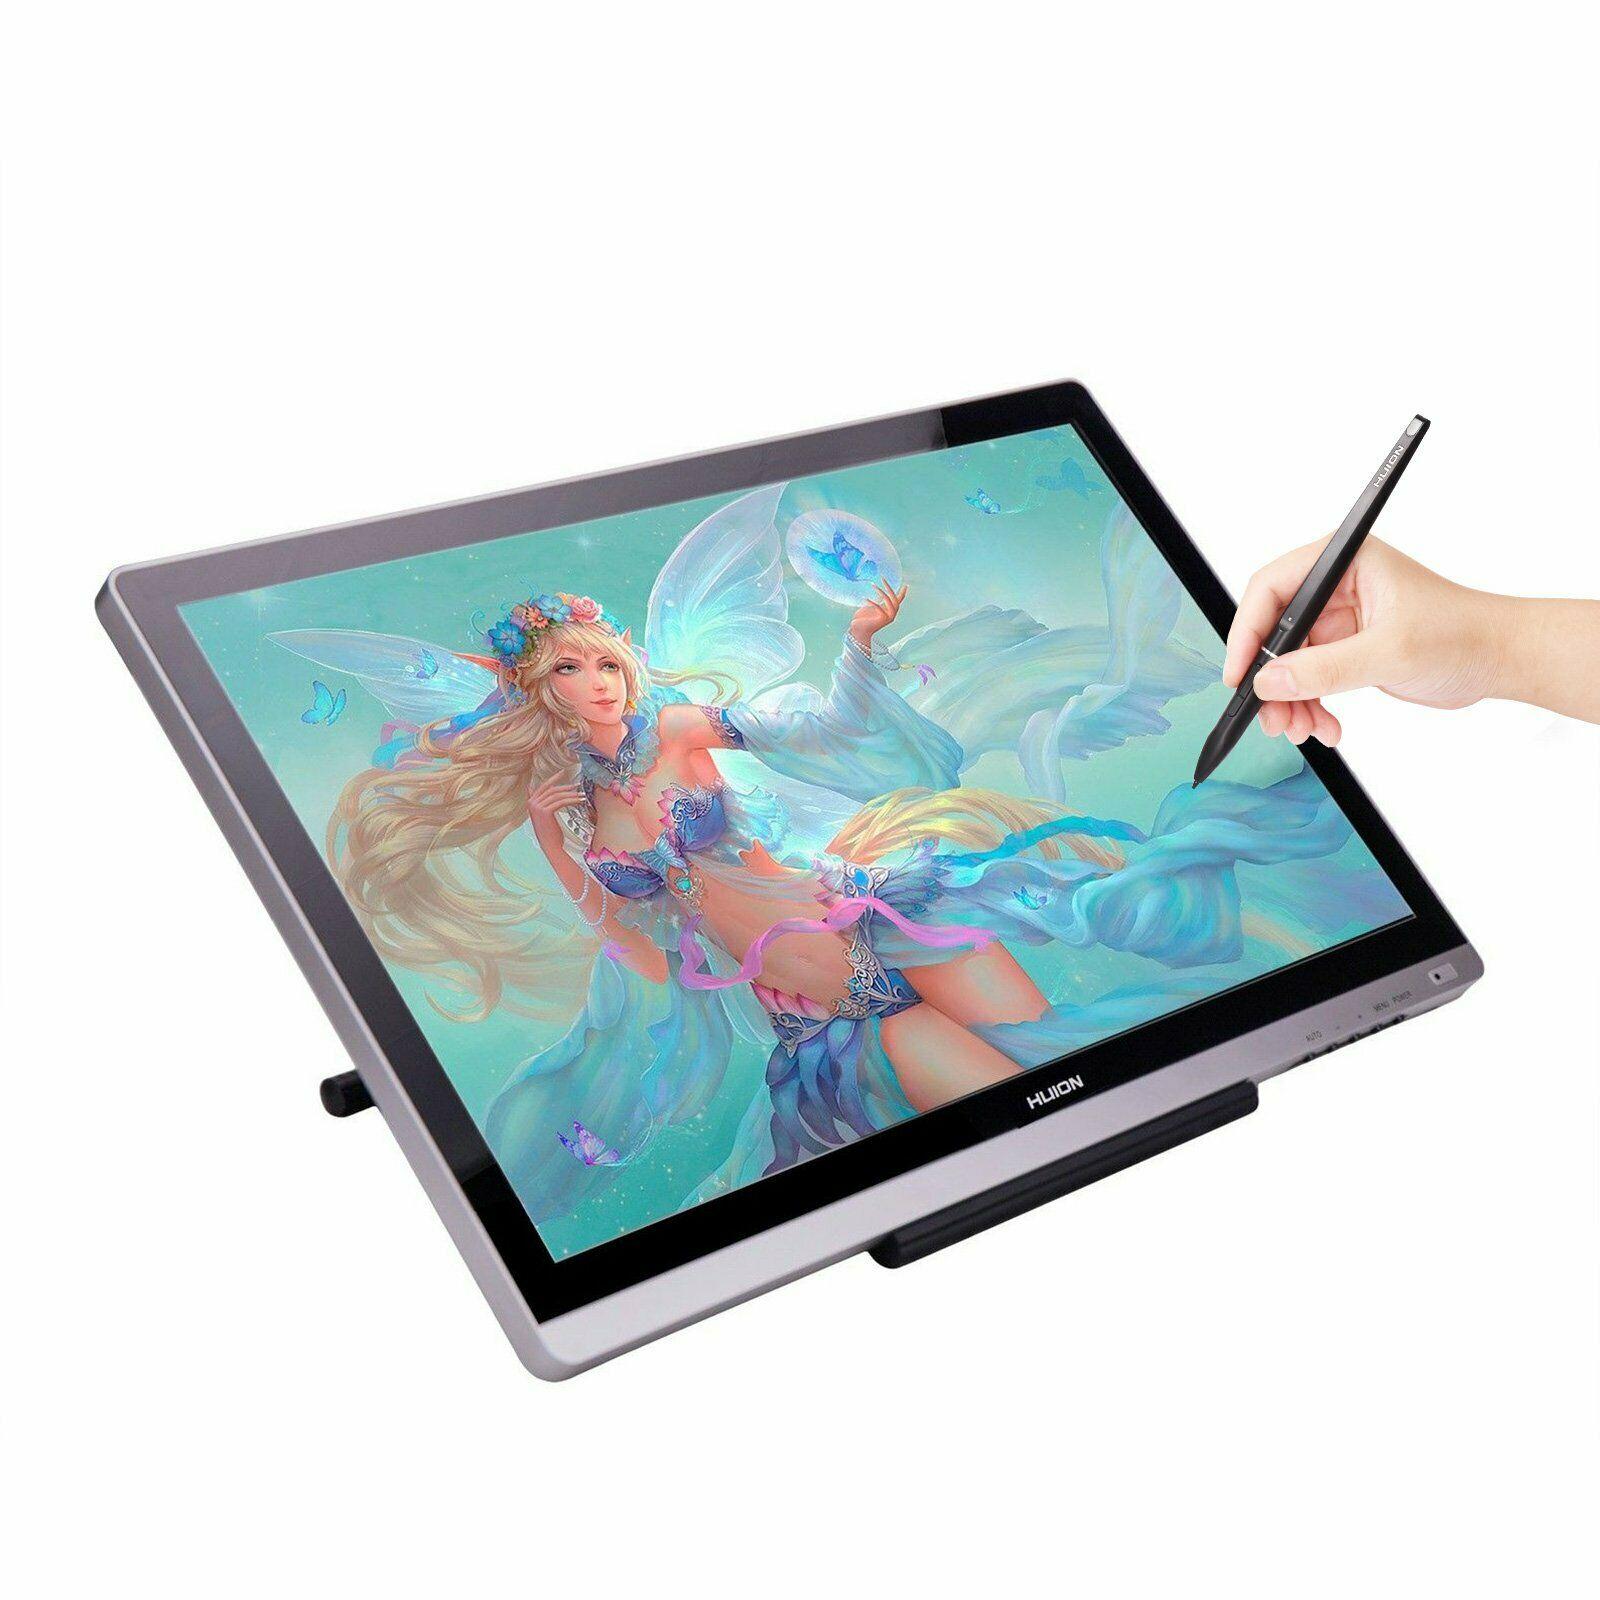 Huion GT220 v2 tableta gráfica Monitor de dibujo profesional 21,5 HD IPS Pen Display 8192 Pen presión arte animación con regalos